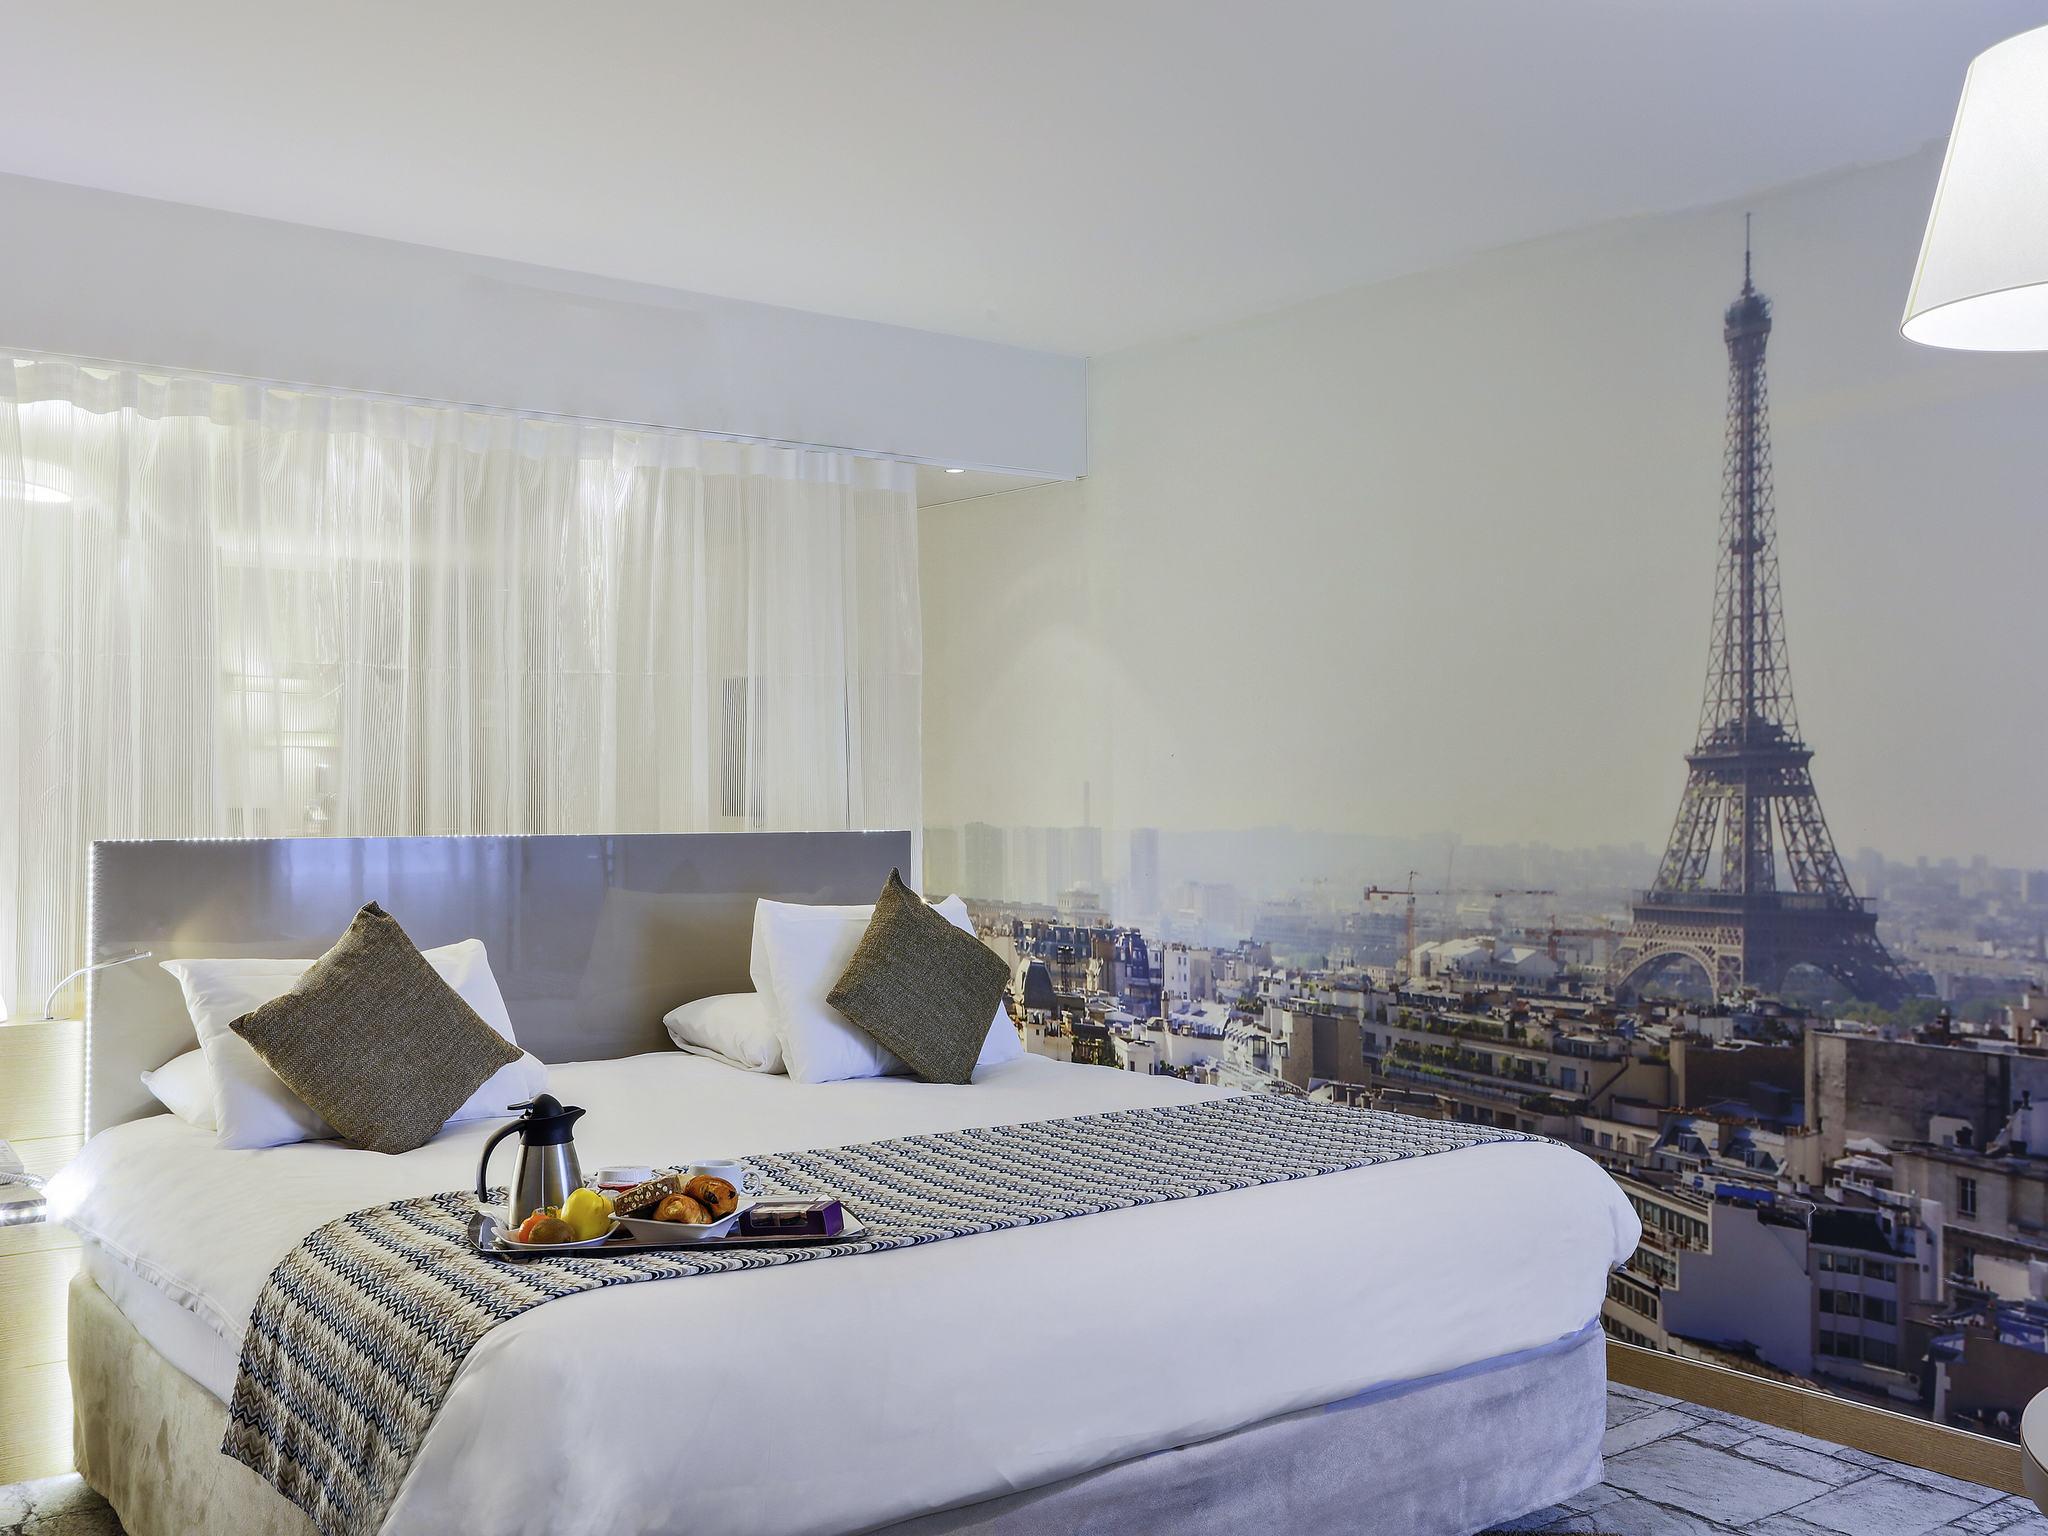 Hotel - Mercure Paris Vaugirard Porte de Versailles Hotel